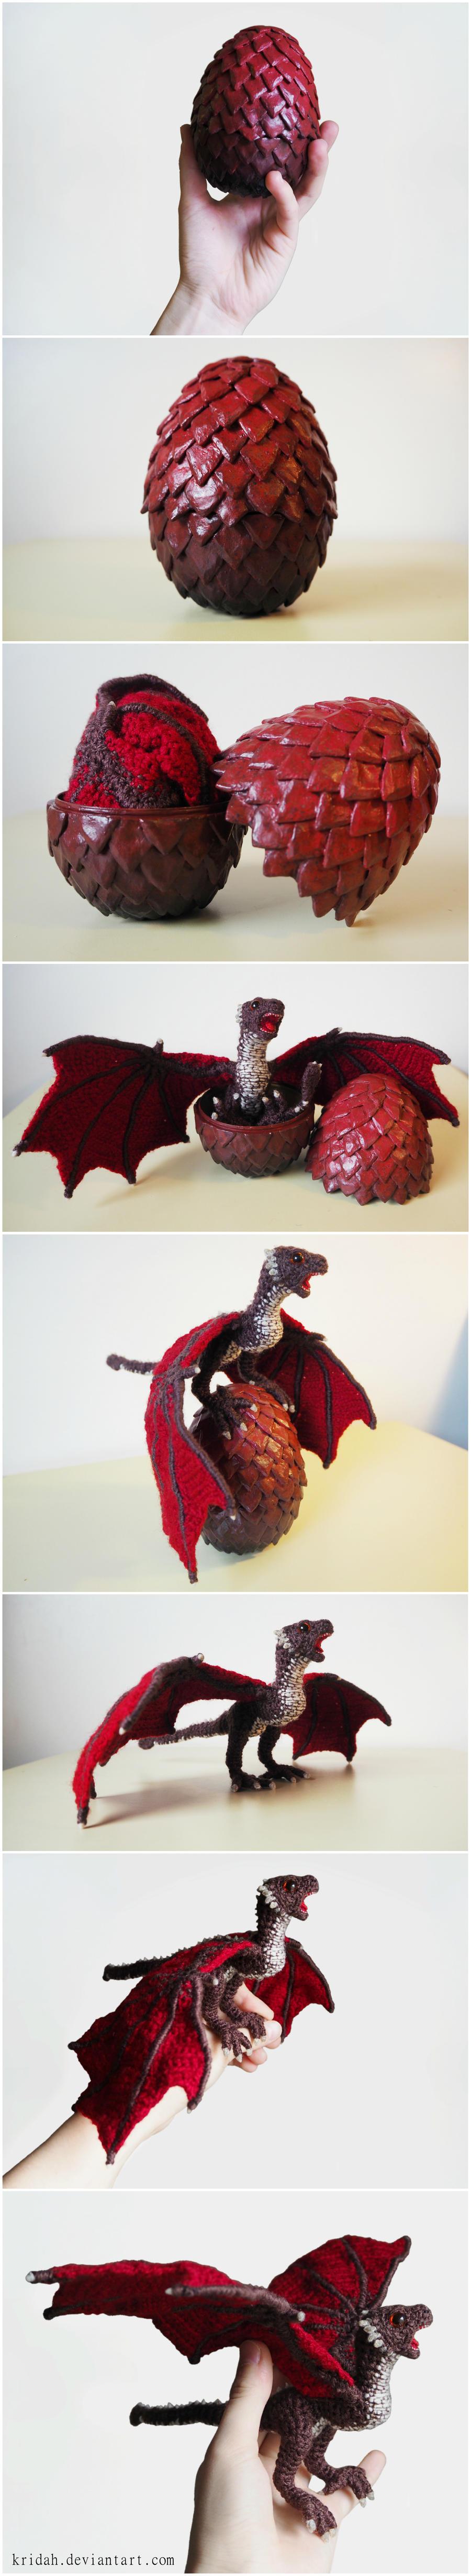 Baby Dragon and Egg by Kridah